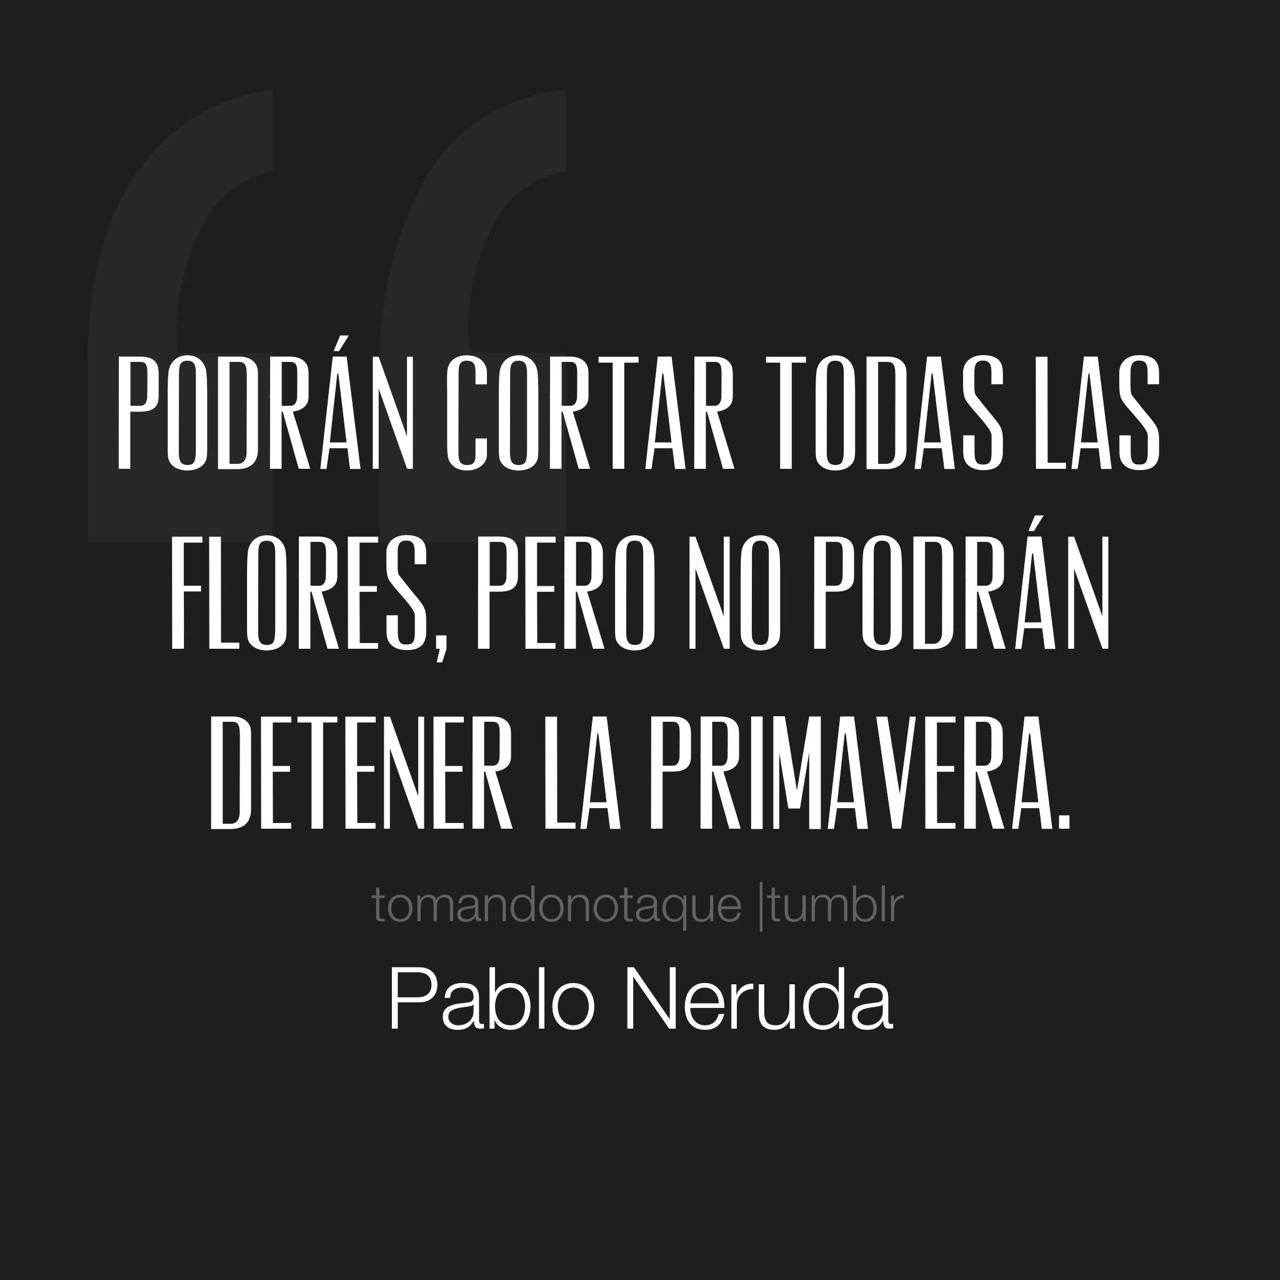 reflective statement on pablo neruda Pablo neruda powerpoint presentation, ppt  pablo neruda powerpoint presentation, ppt - docslides  be useful for you reflective statement slide5 intro to pablo.